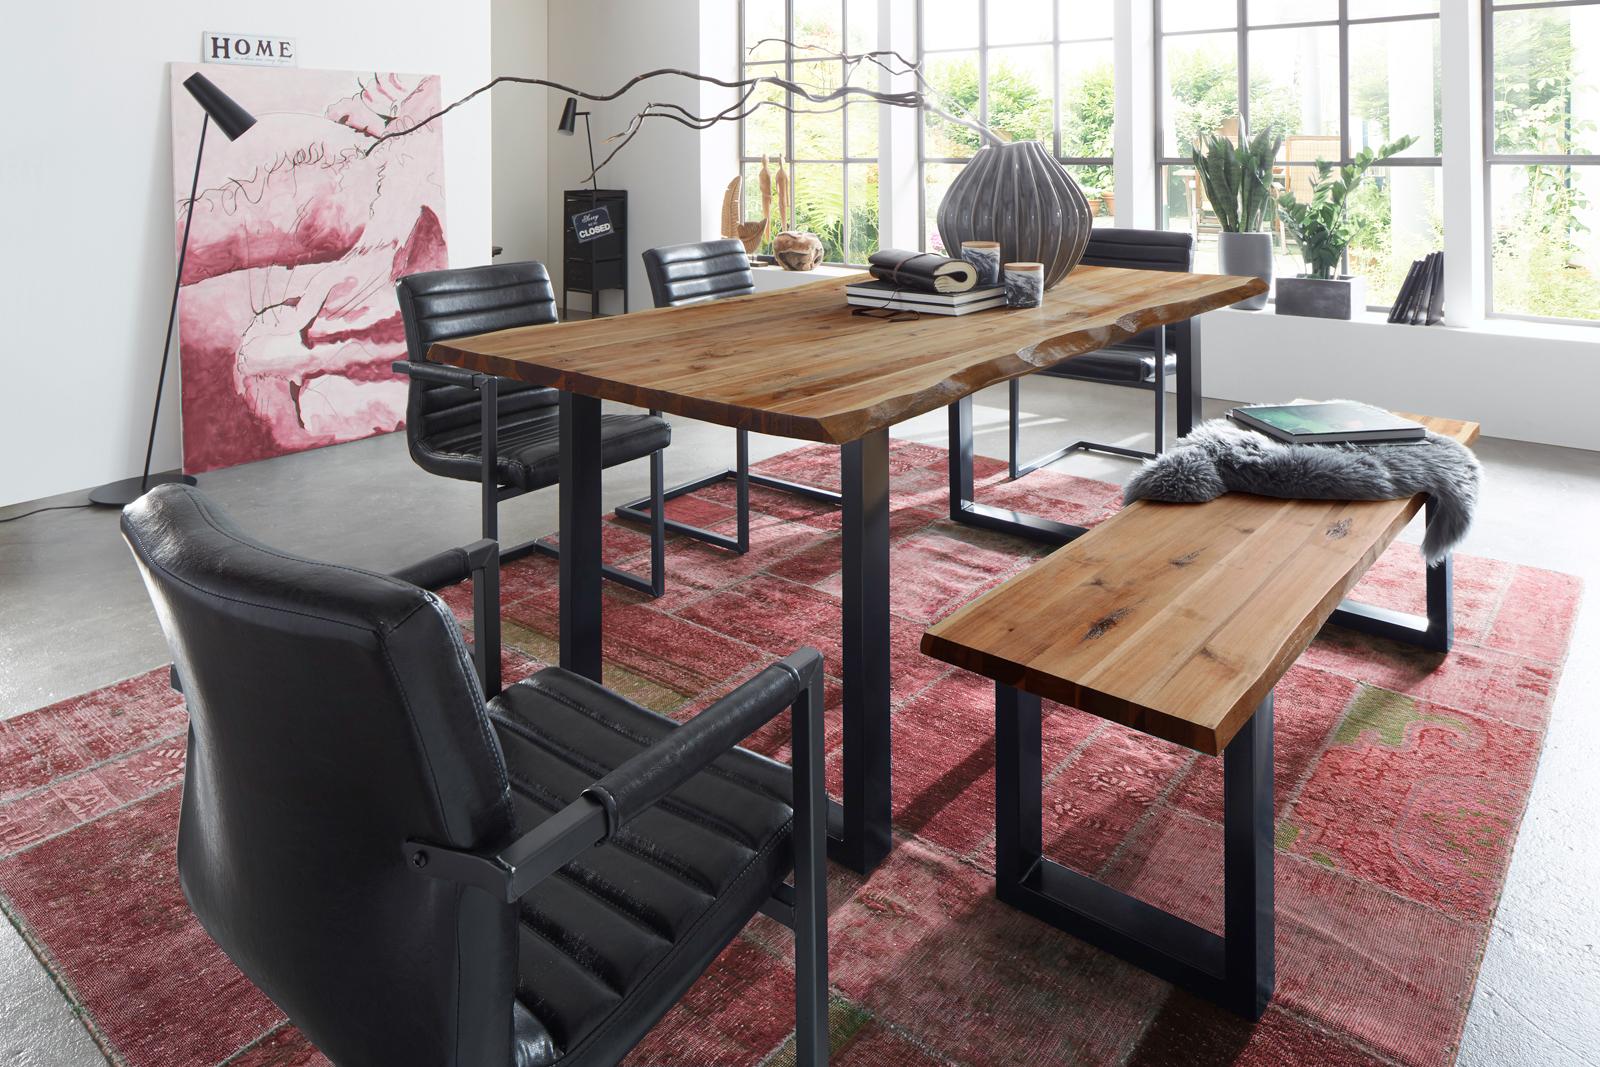 essgruppe mit sofa essgruppe mit von venjakob with essgruppe mit sofa free standard furniture. Black Bedroom Furniture Sets. Home Design Ideas